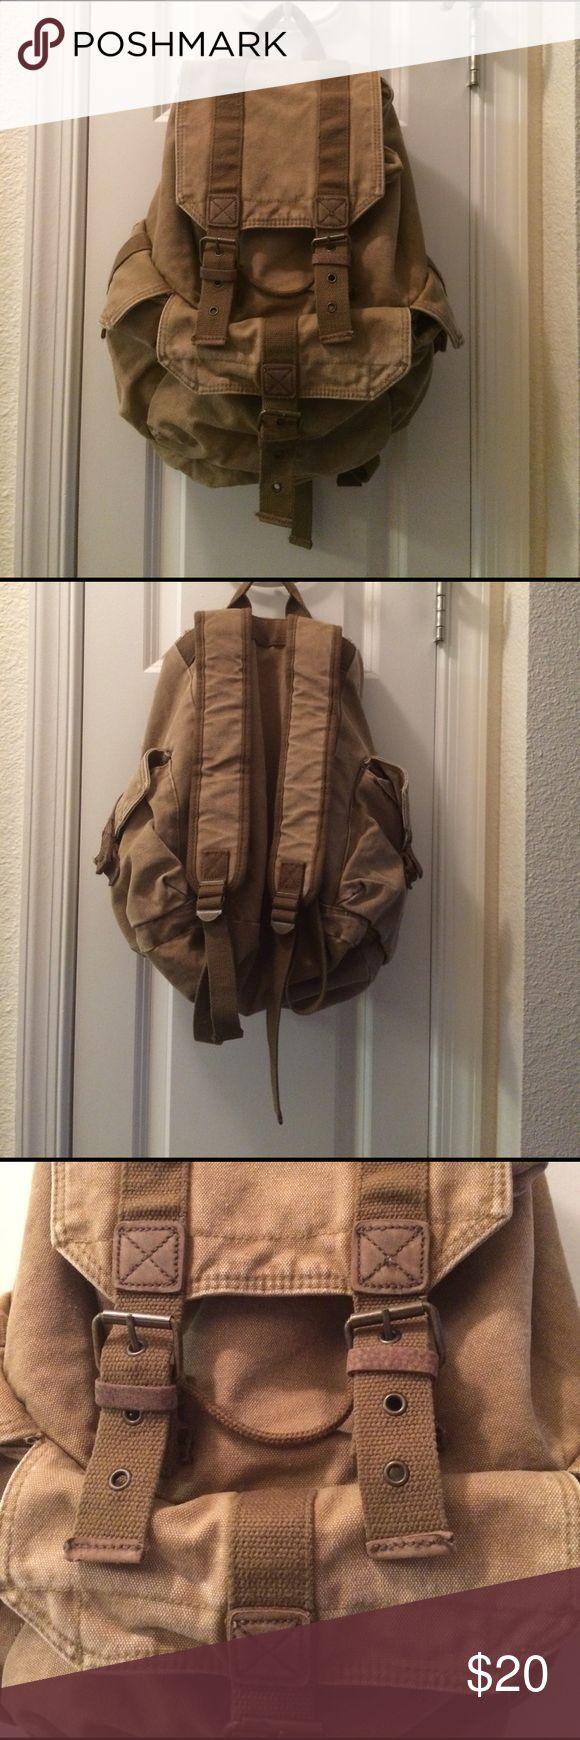 Old Navy Vintage Back Pack. Very cute Old Navy Vintage backpack 🎒. Never used and very original. Old Navy Bags Backpacks